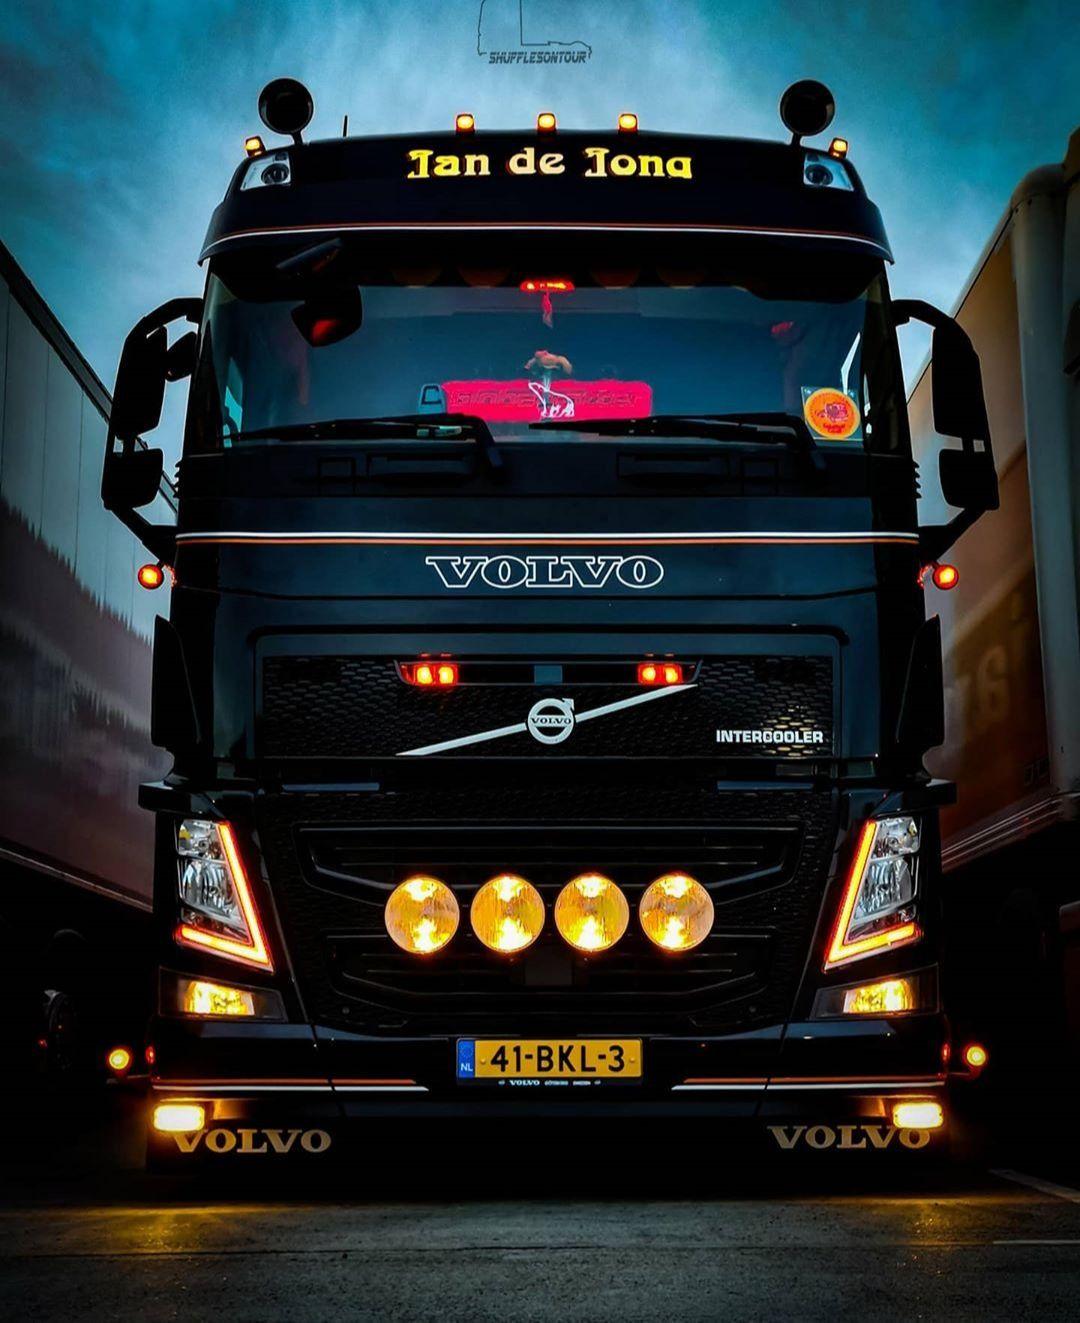 Volvo Intercooler In 2020 Volvo Volvo Trucks Trucks